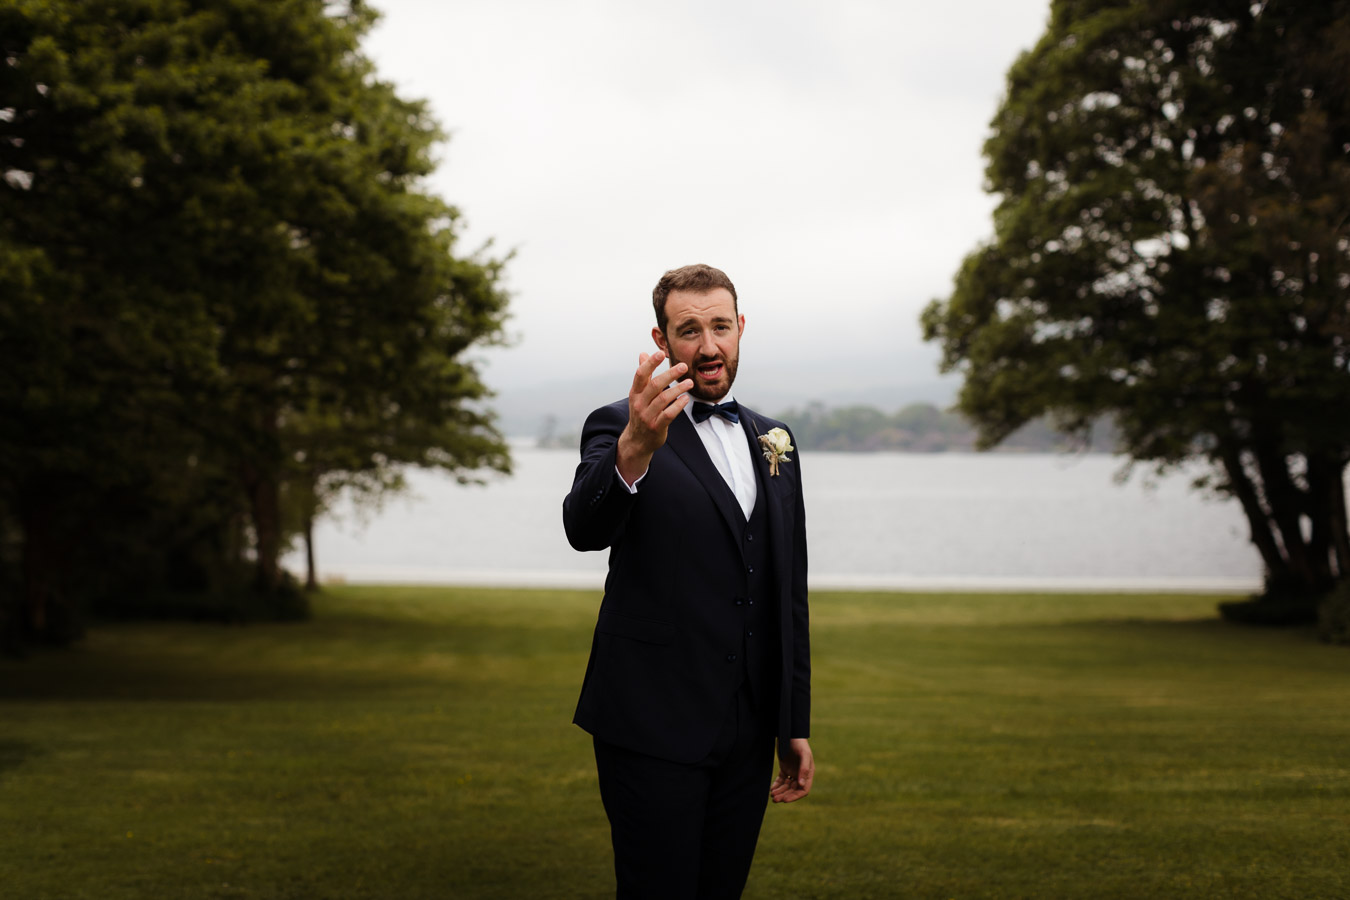 groom blacktie